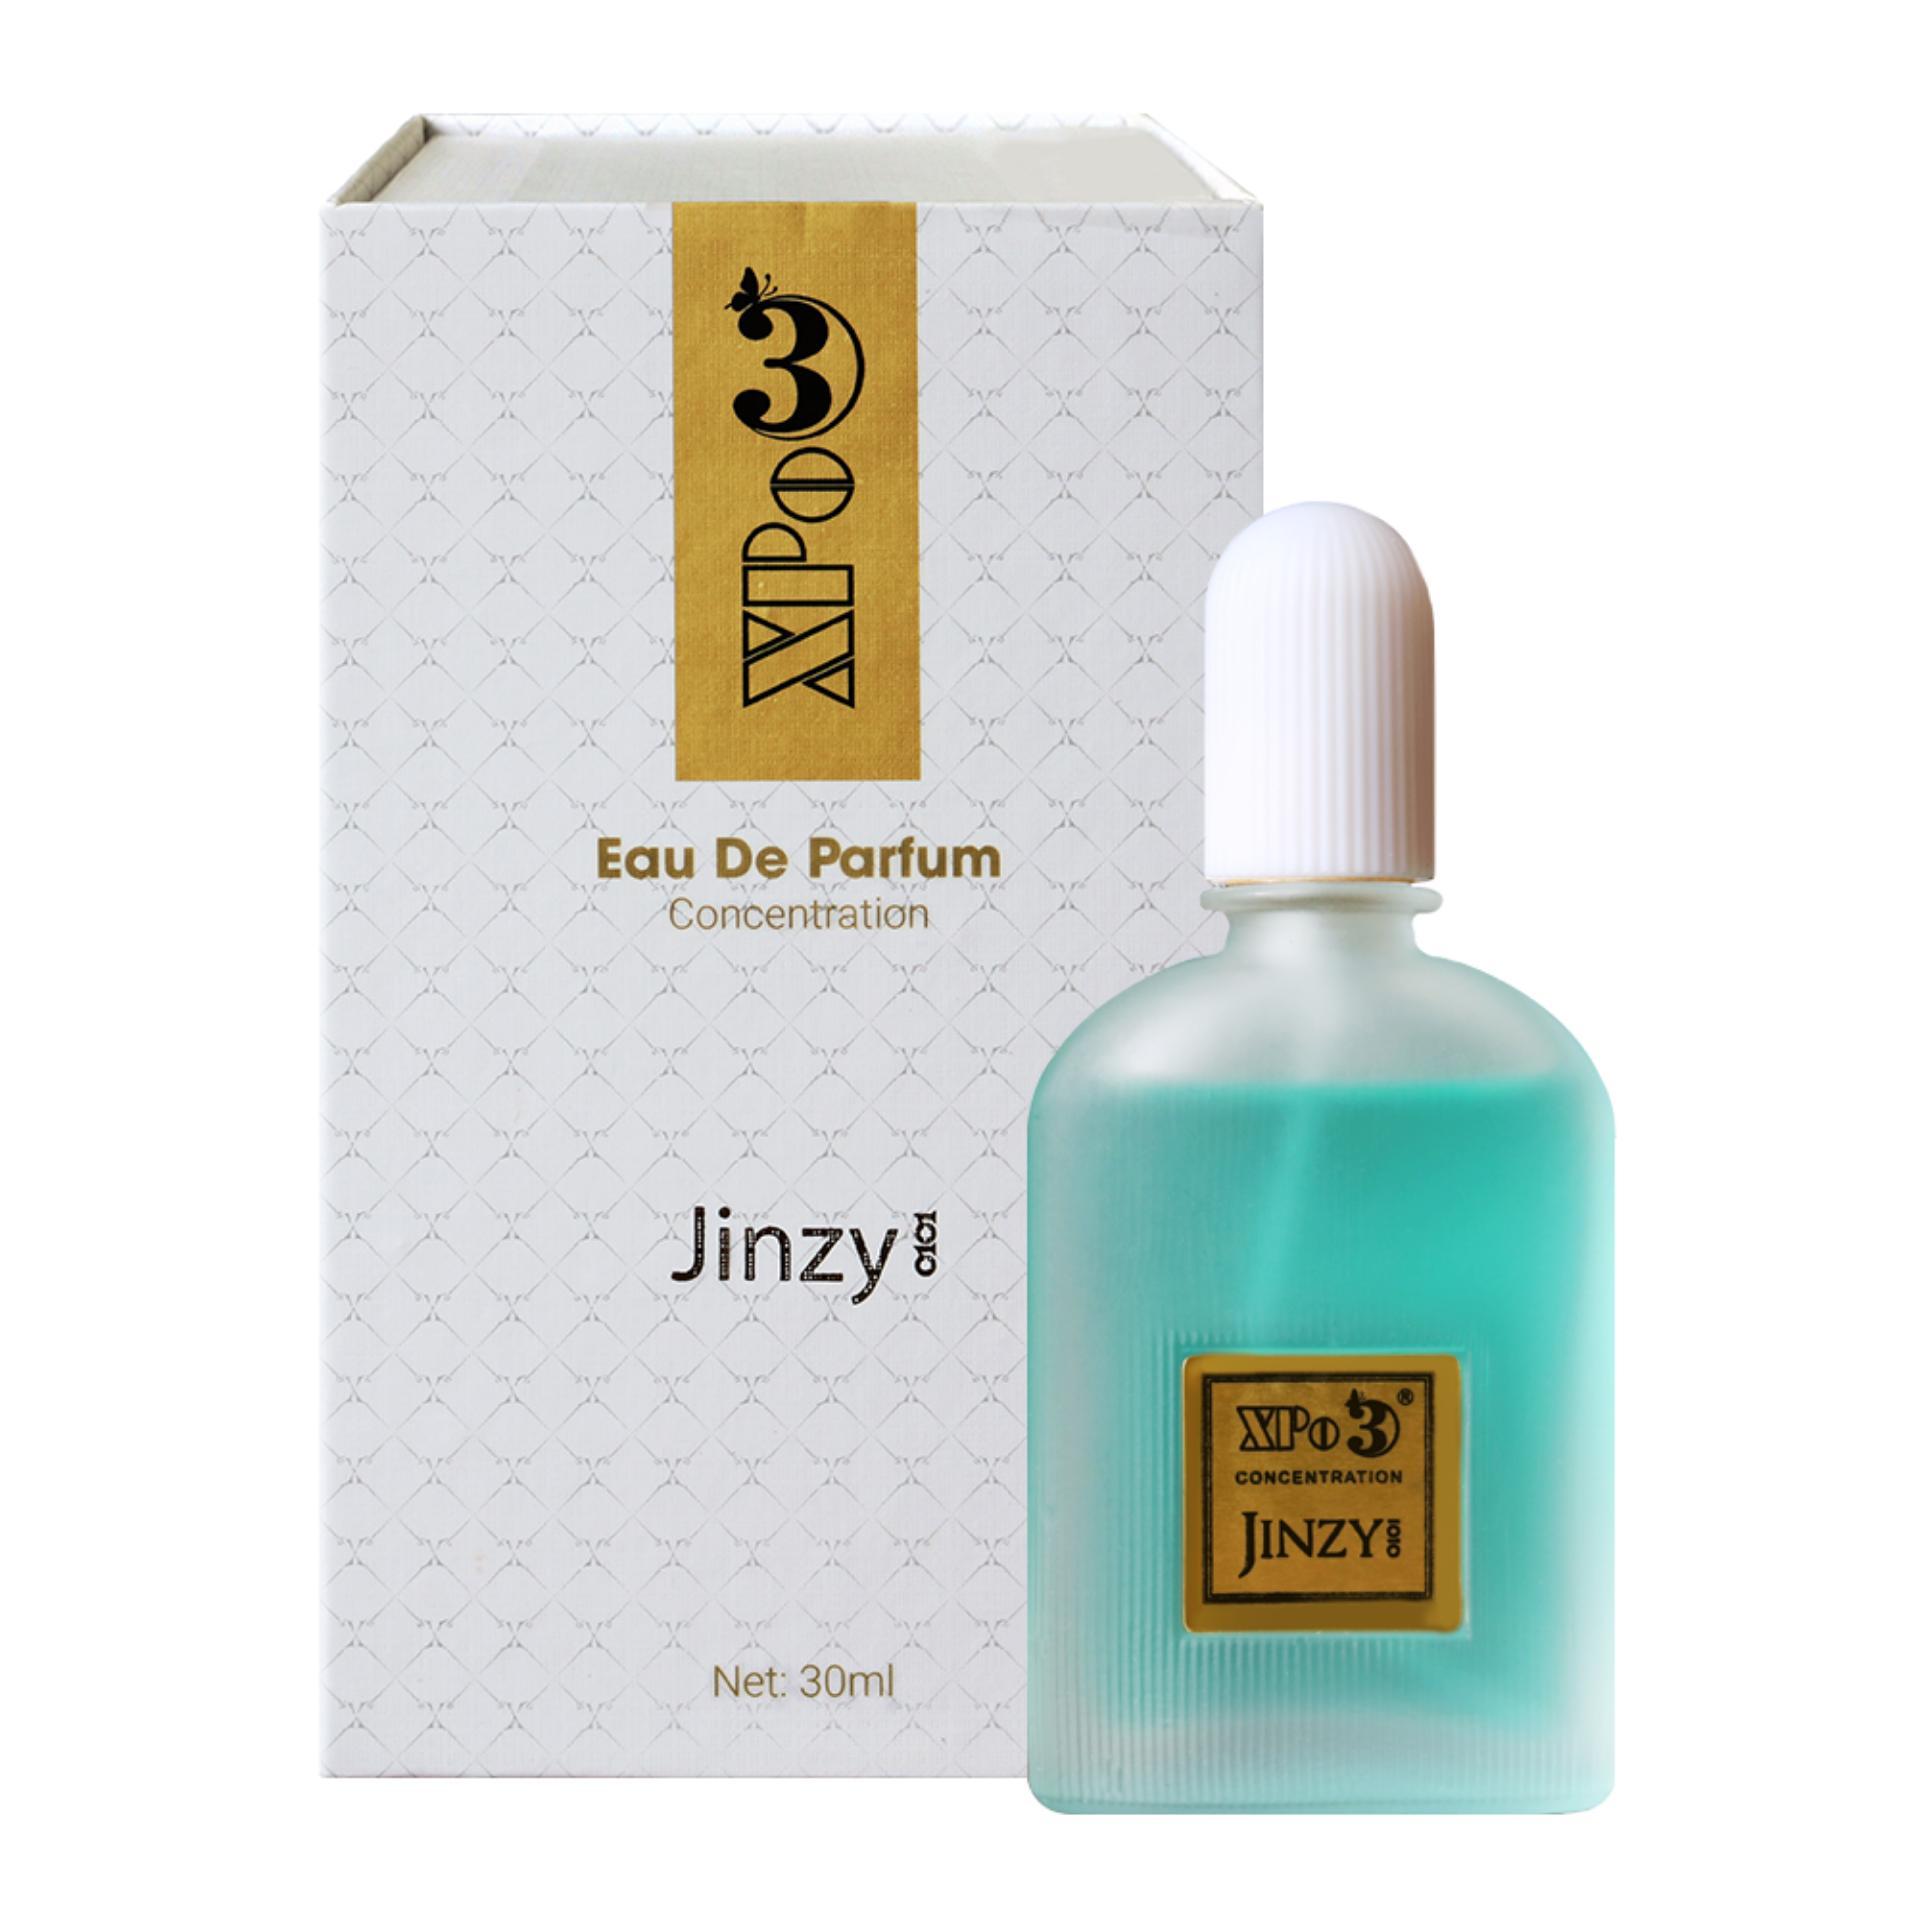 Nước hoa XBeauty XPo3 Jinzy 0101 30ml nhập khẩu